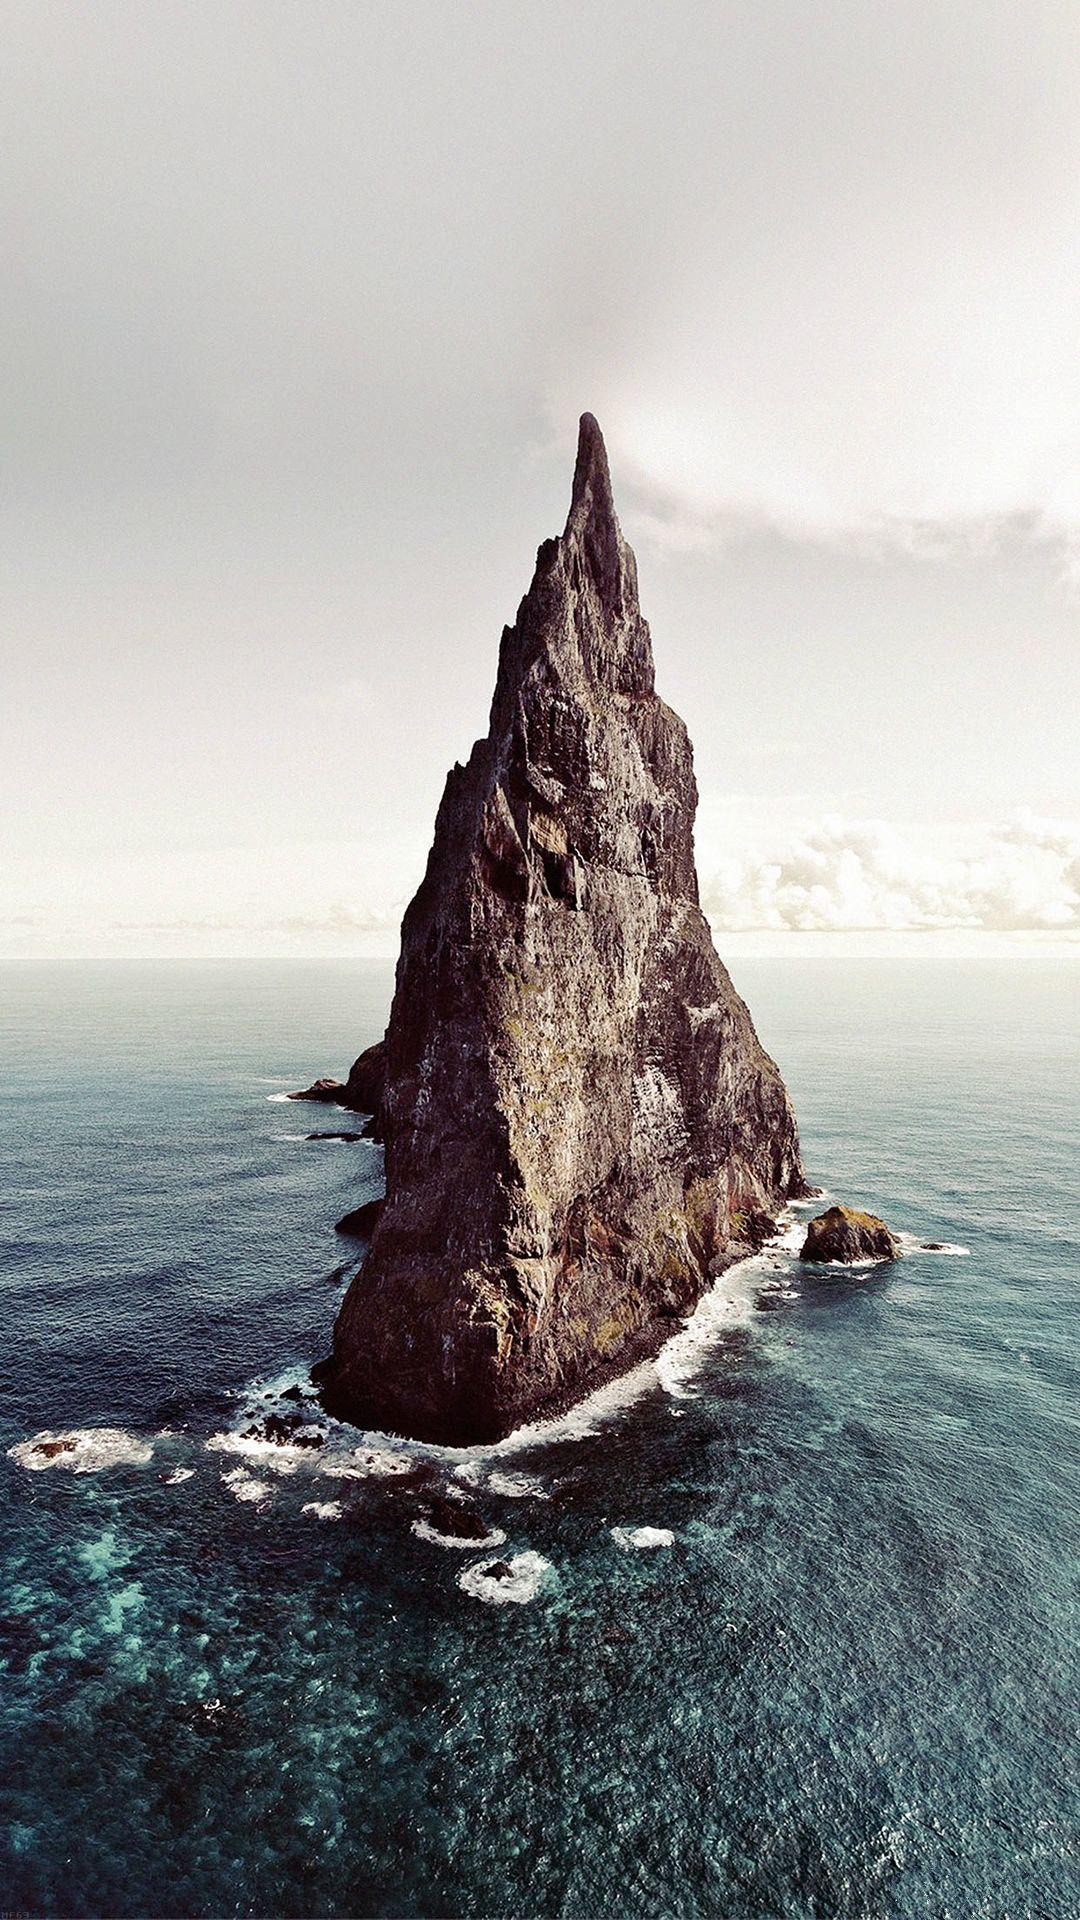 Wallpaper iphone sea - Island Of Lonely Papillon Sea Ocean Nature Iphone 6 Plus Wallpaper